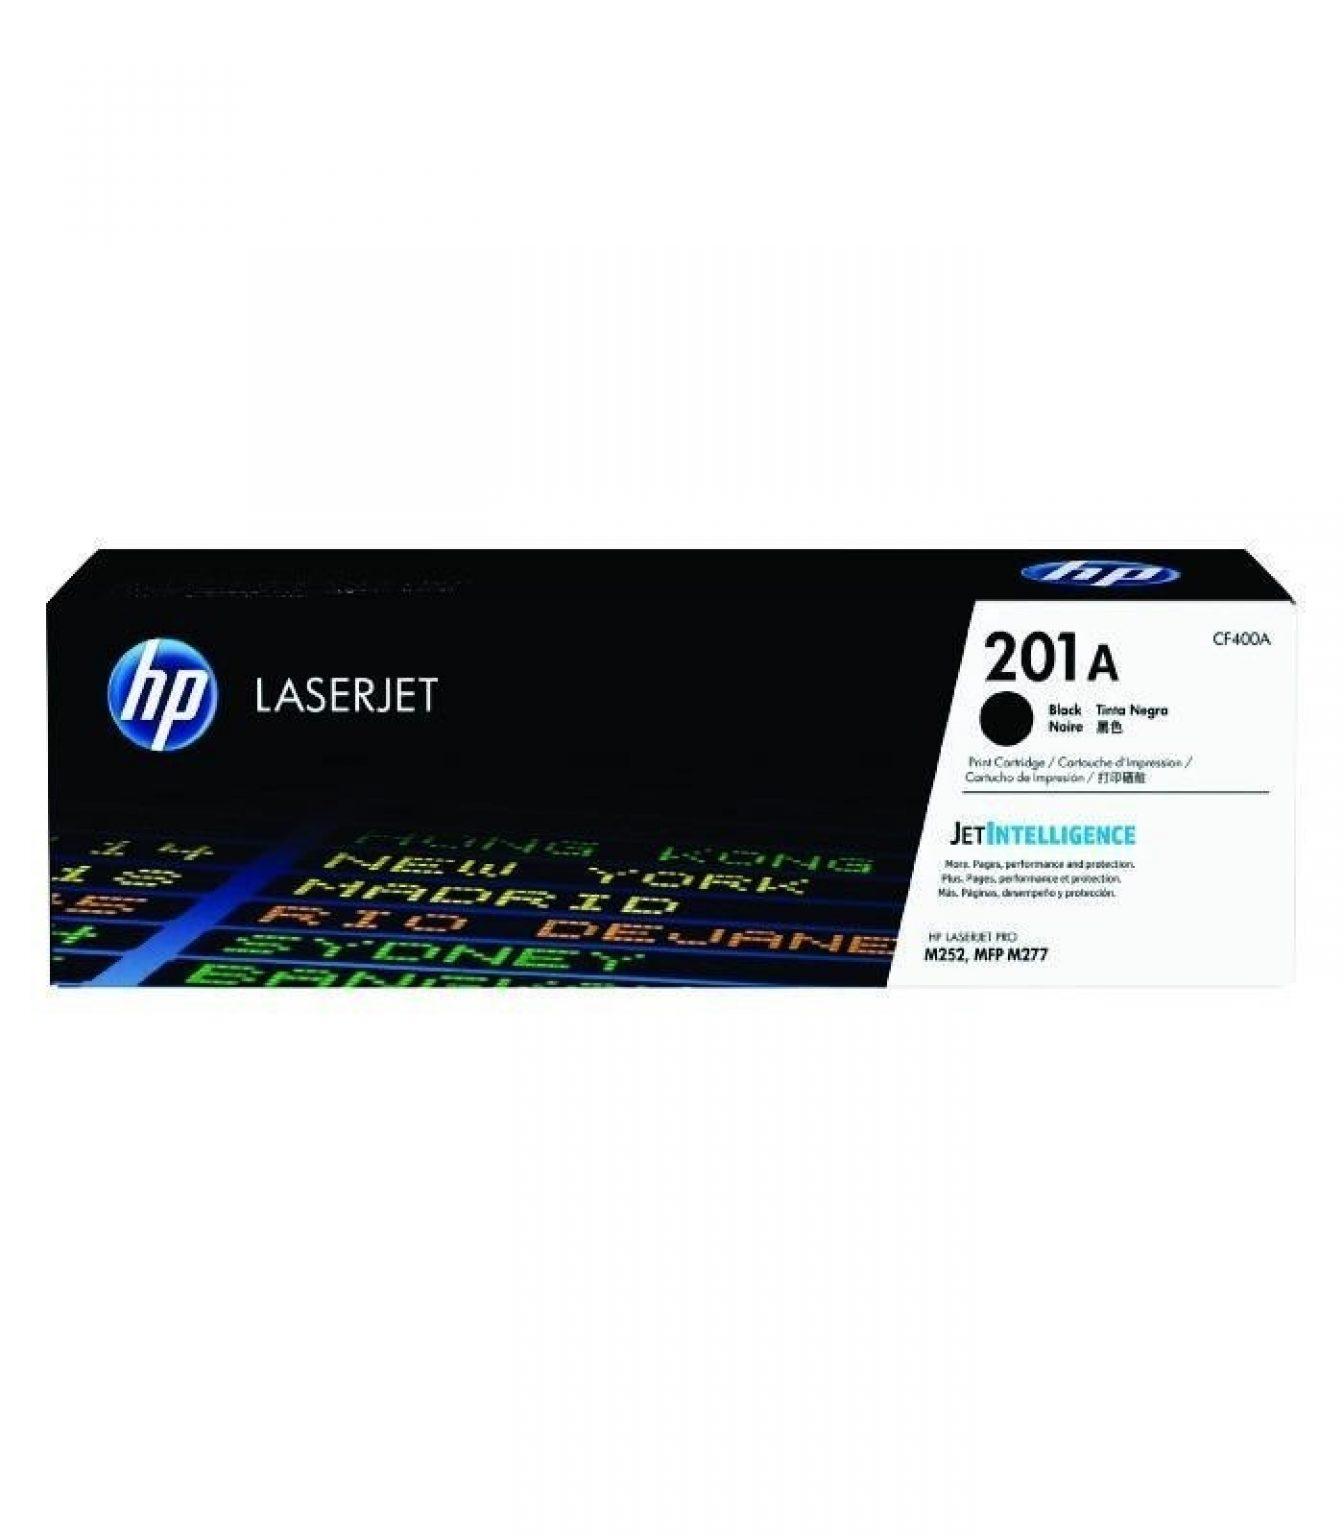 HP - 201A Black LaserJet Toner Cartridge [CF400A]